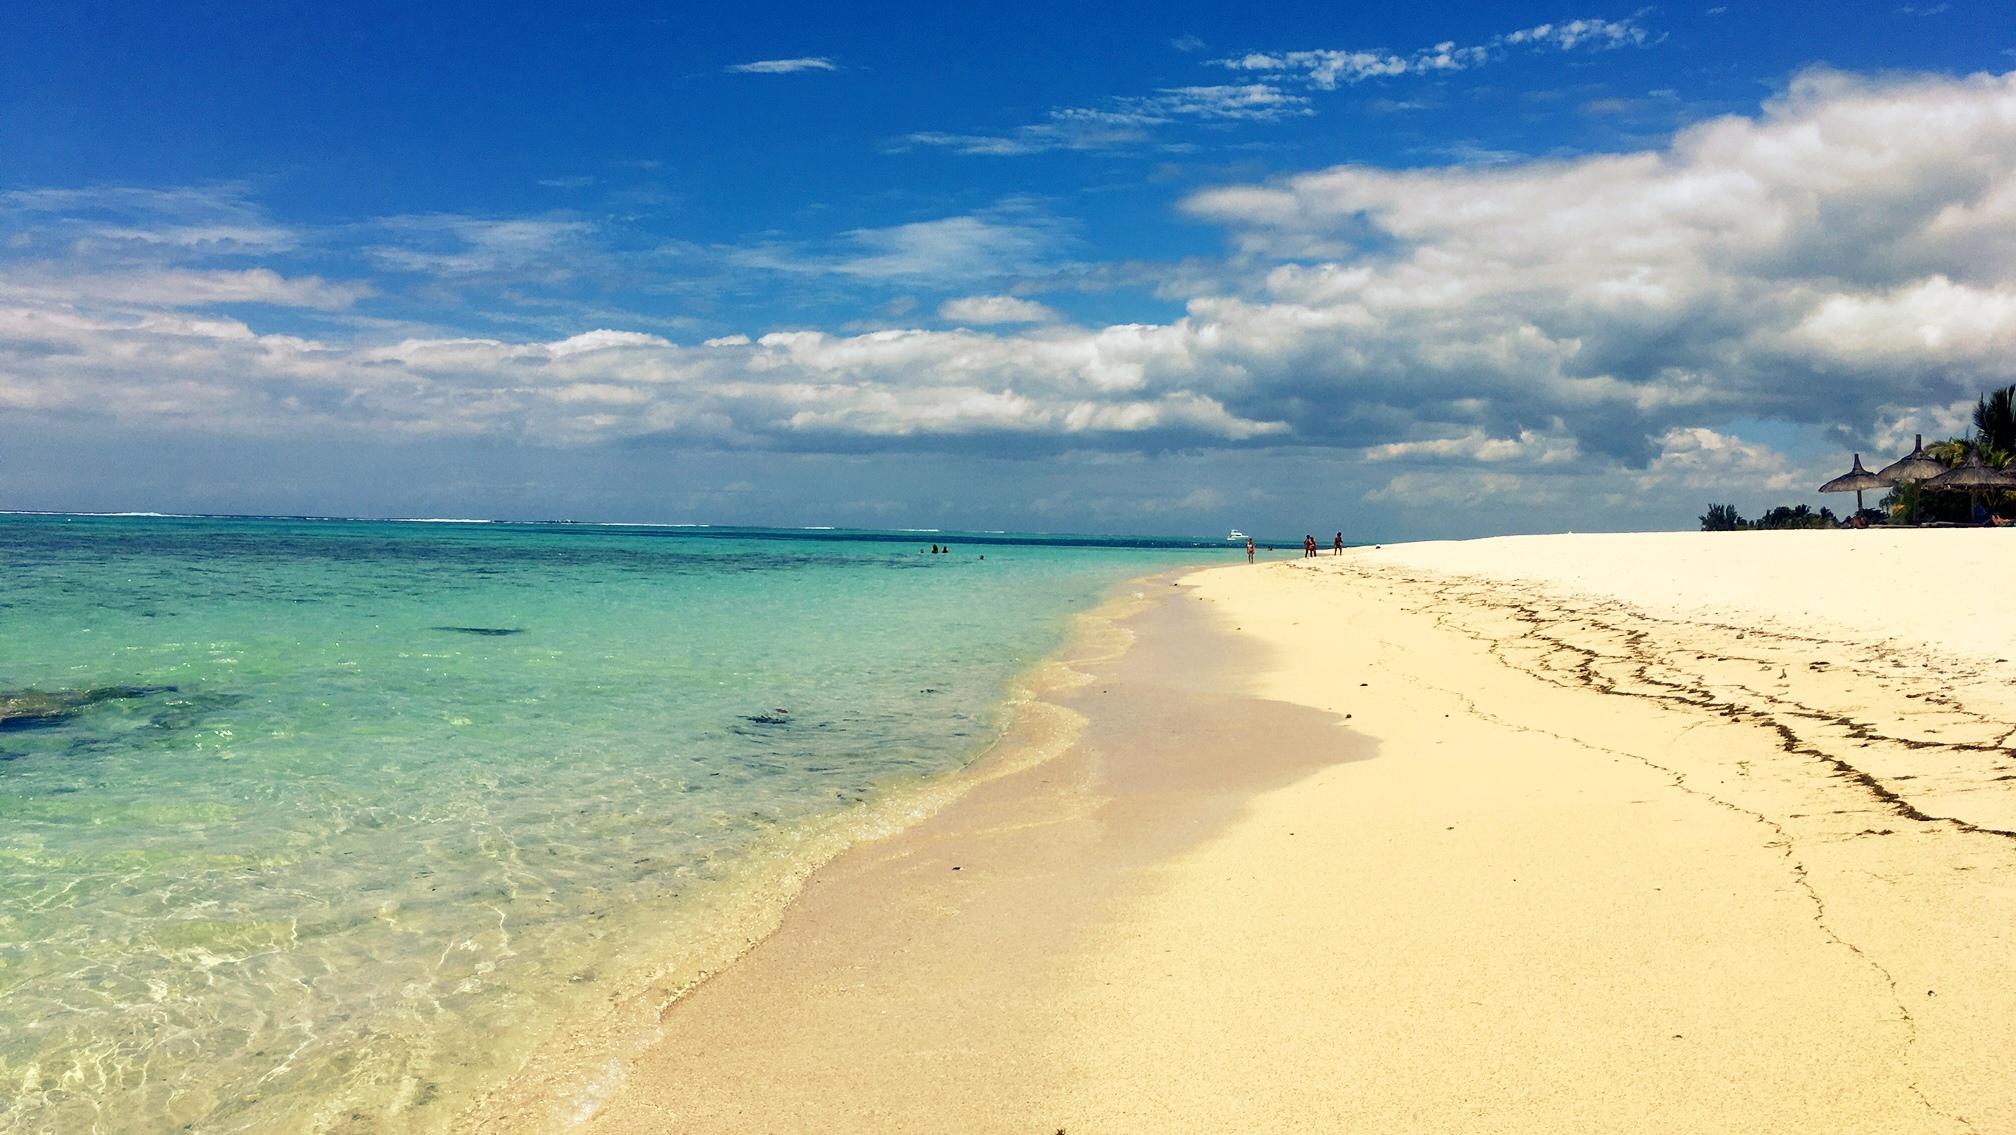 Mauricius - Le Morne Beach u hotelu Dinarobin Beachcomber / Foto: Petra Švehlová Stowasserová